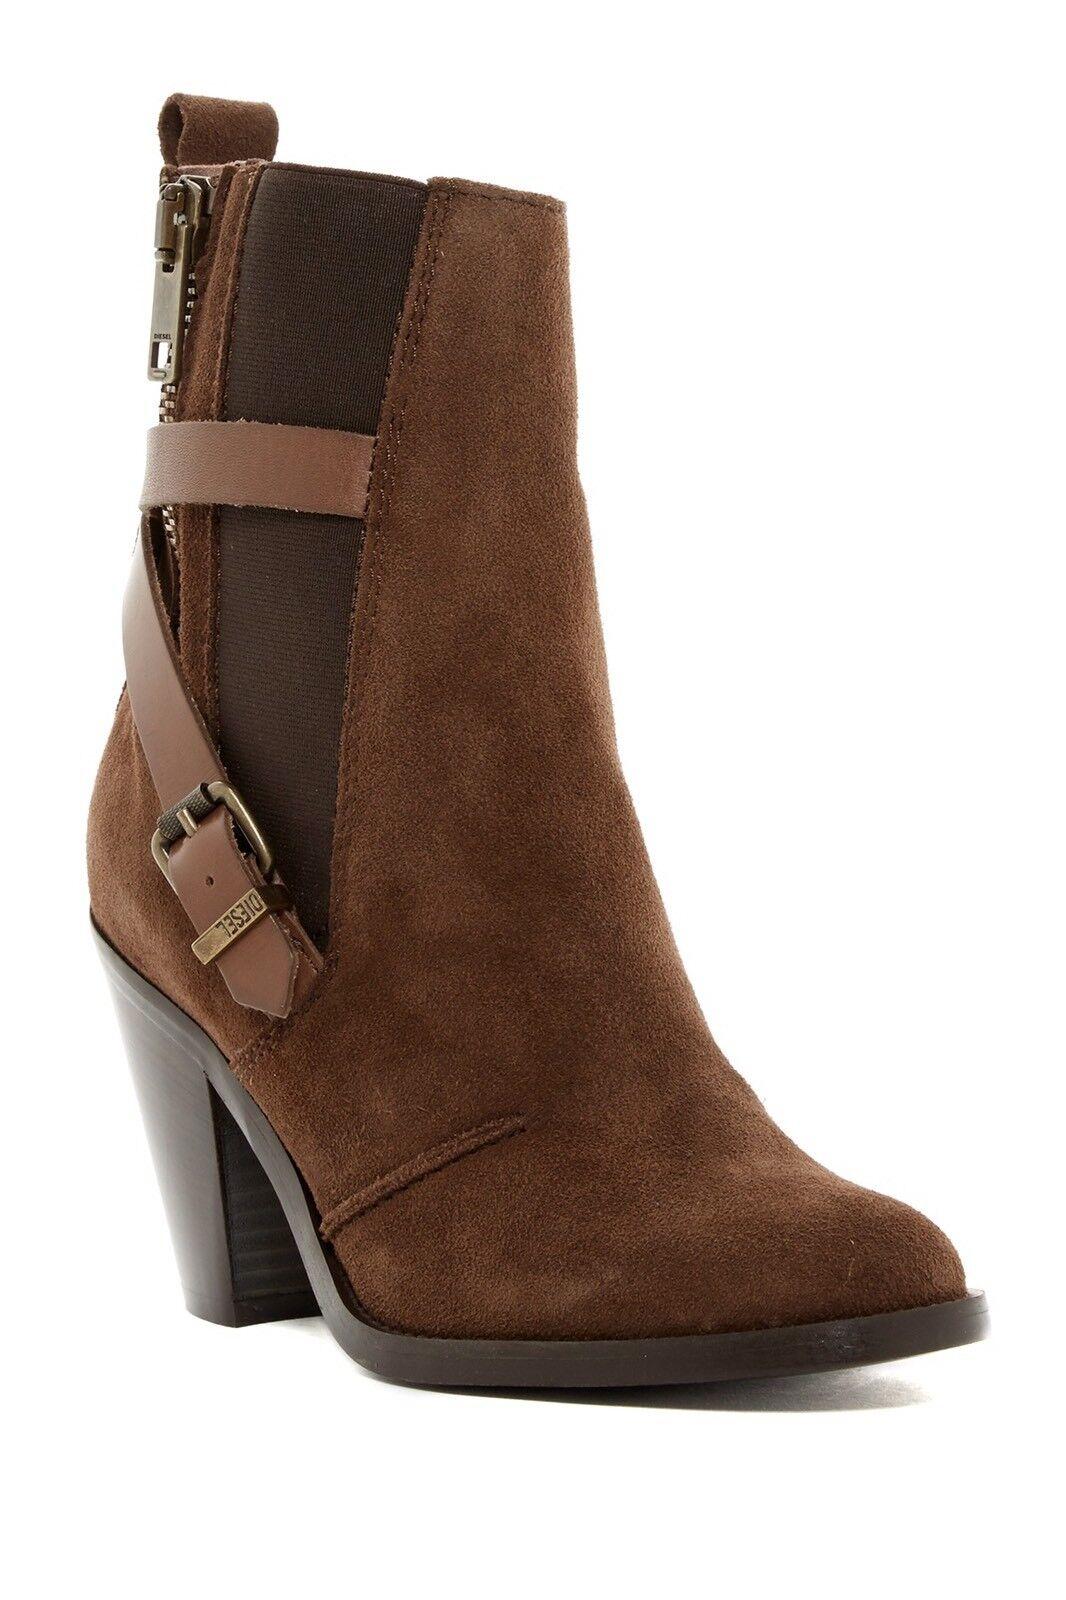 New Women's Diesel Kinley Boot Dark Brown Size 40 MSRP